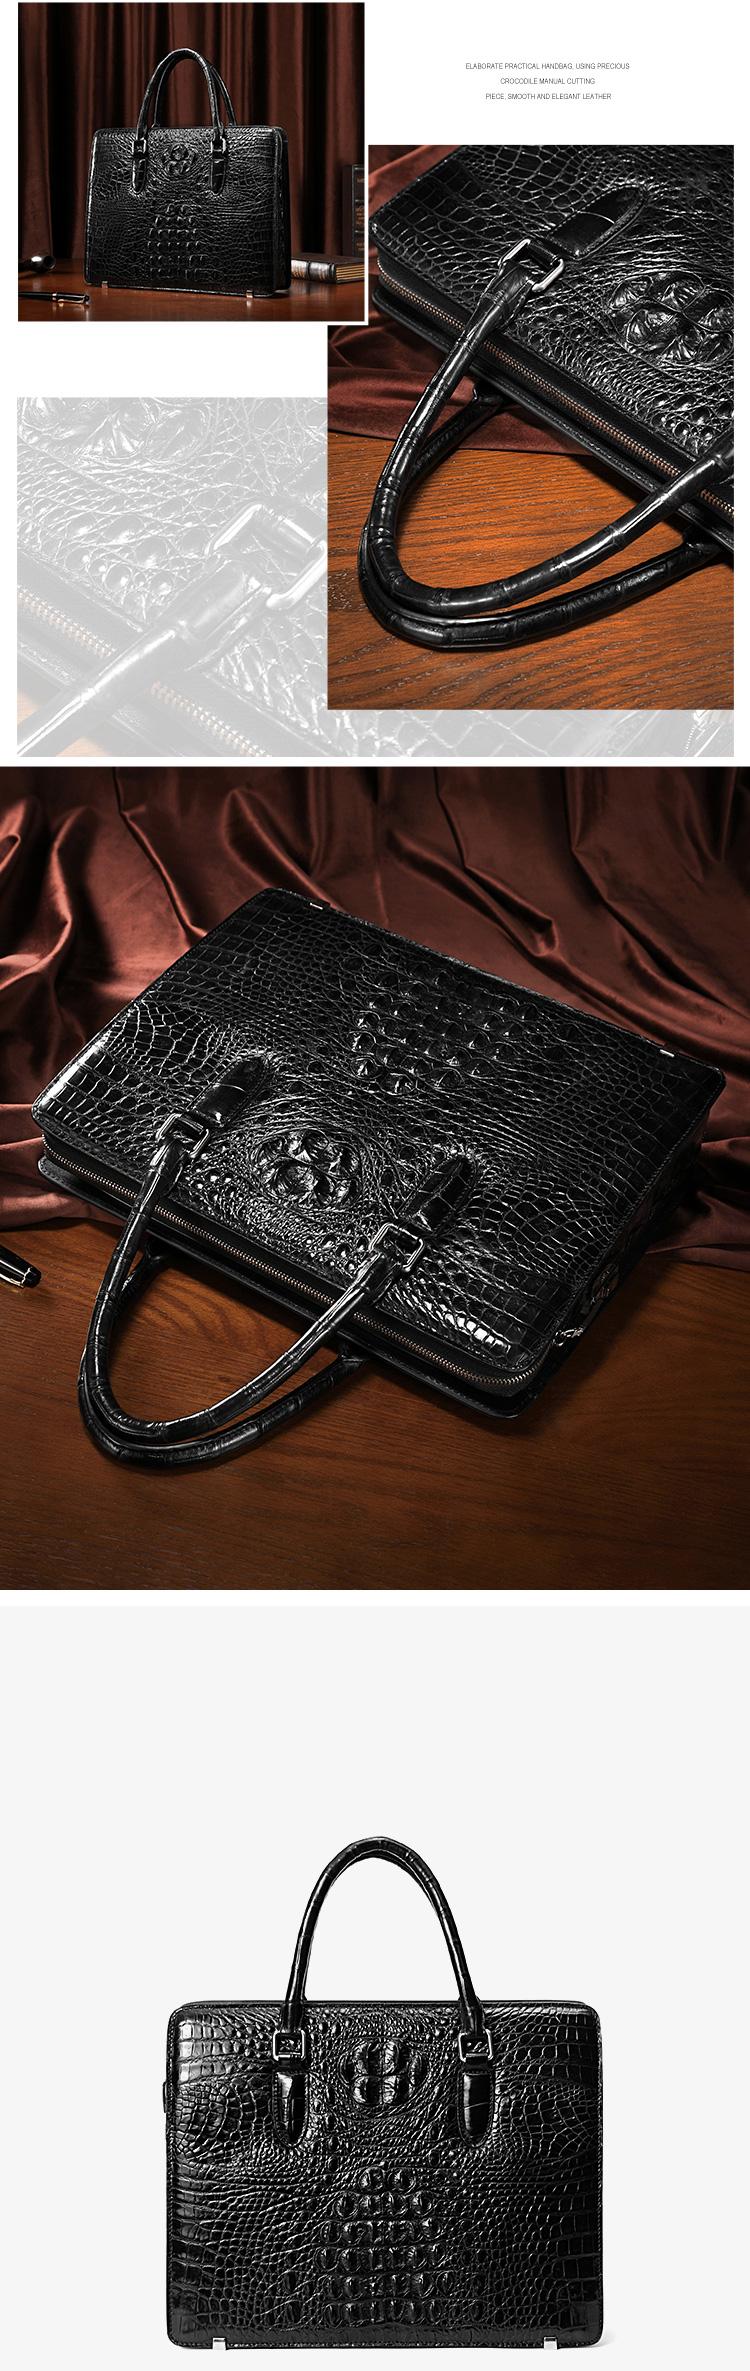 crocodile briefcase (6).jpg